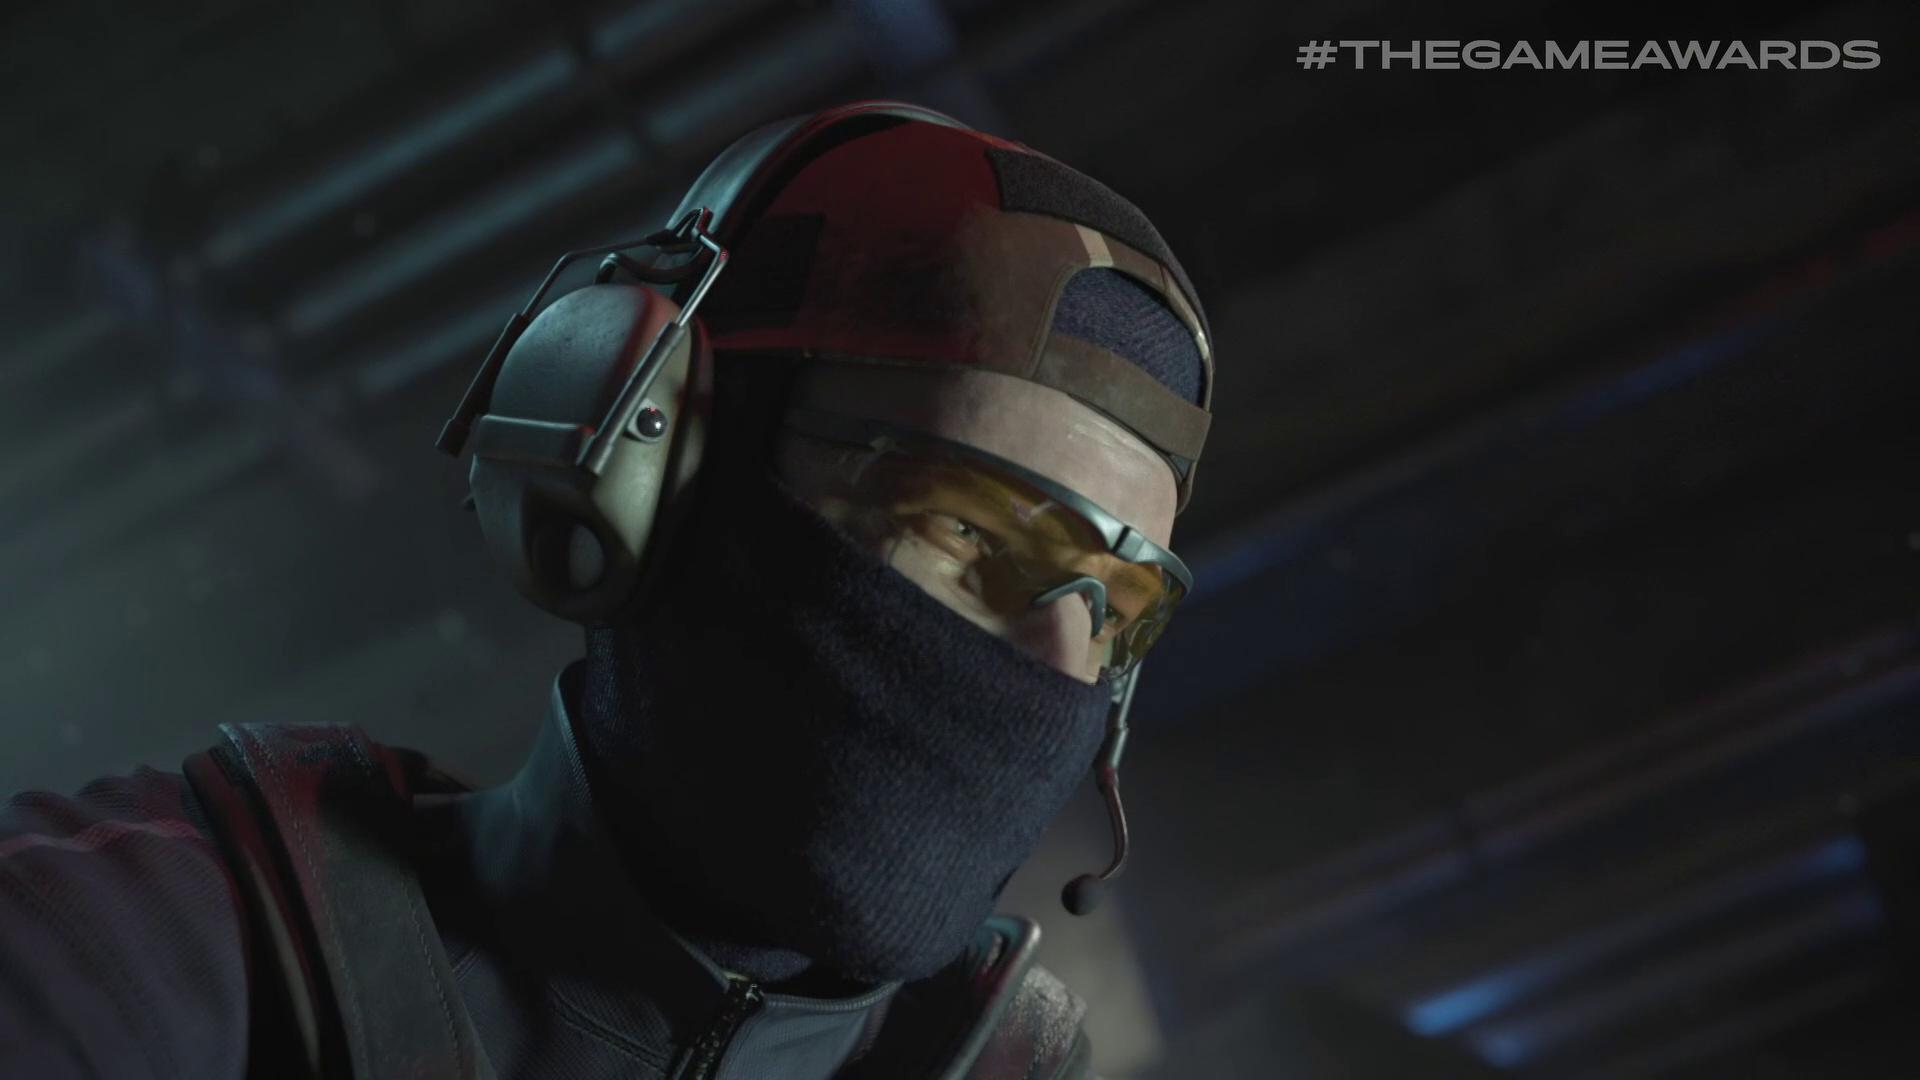 a mercenary wearing a balaclava and headset in Nine to Five